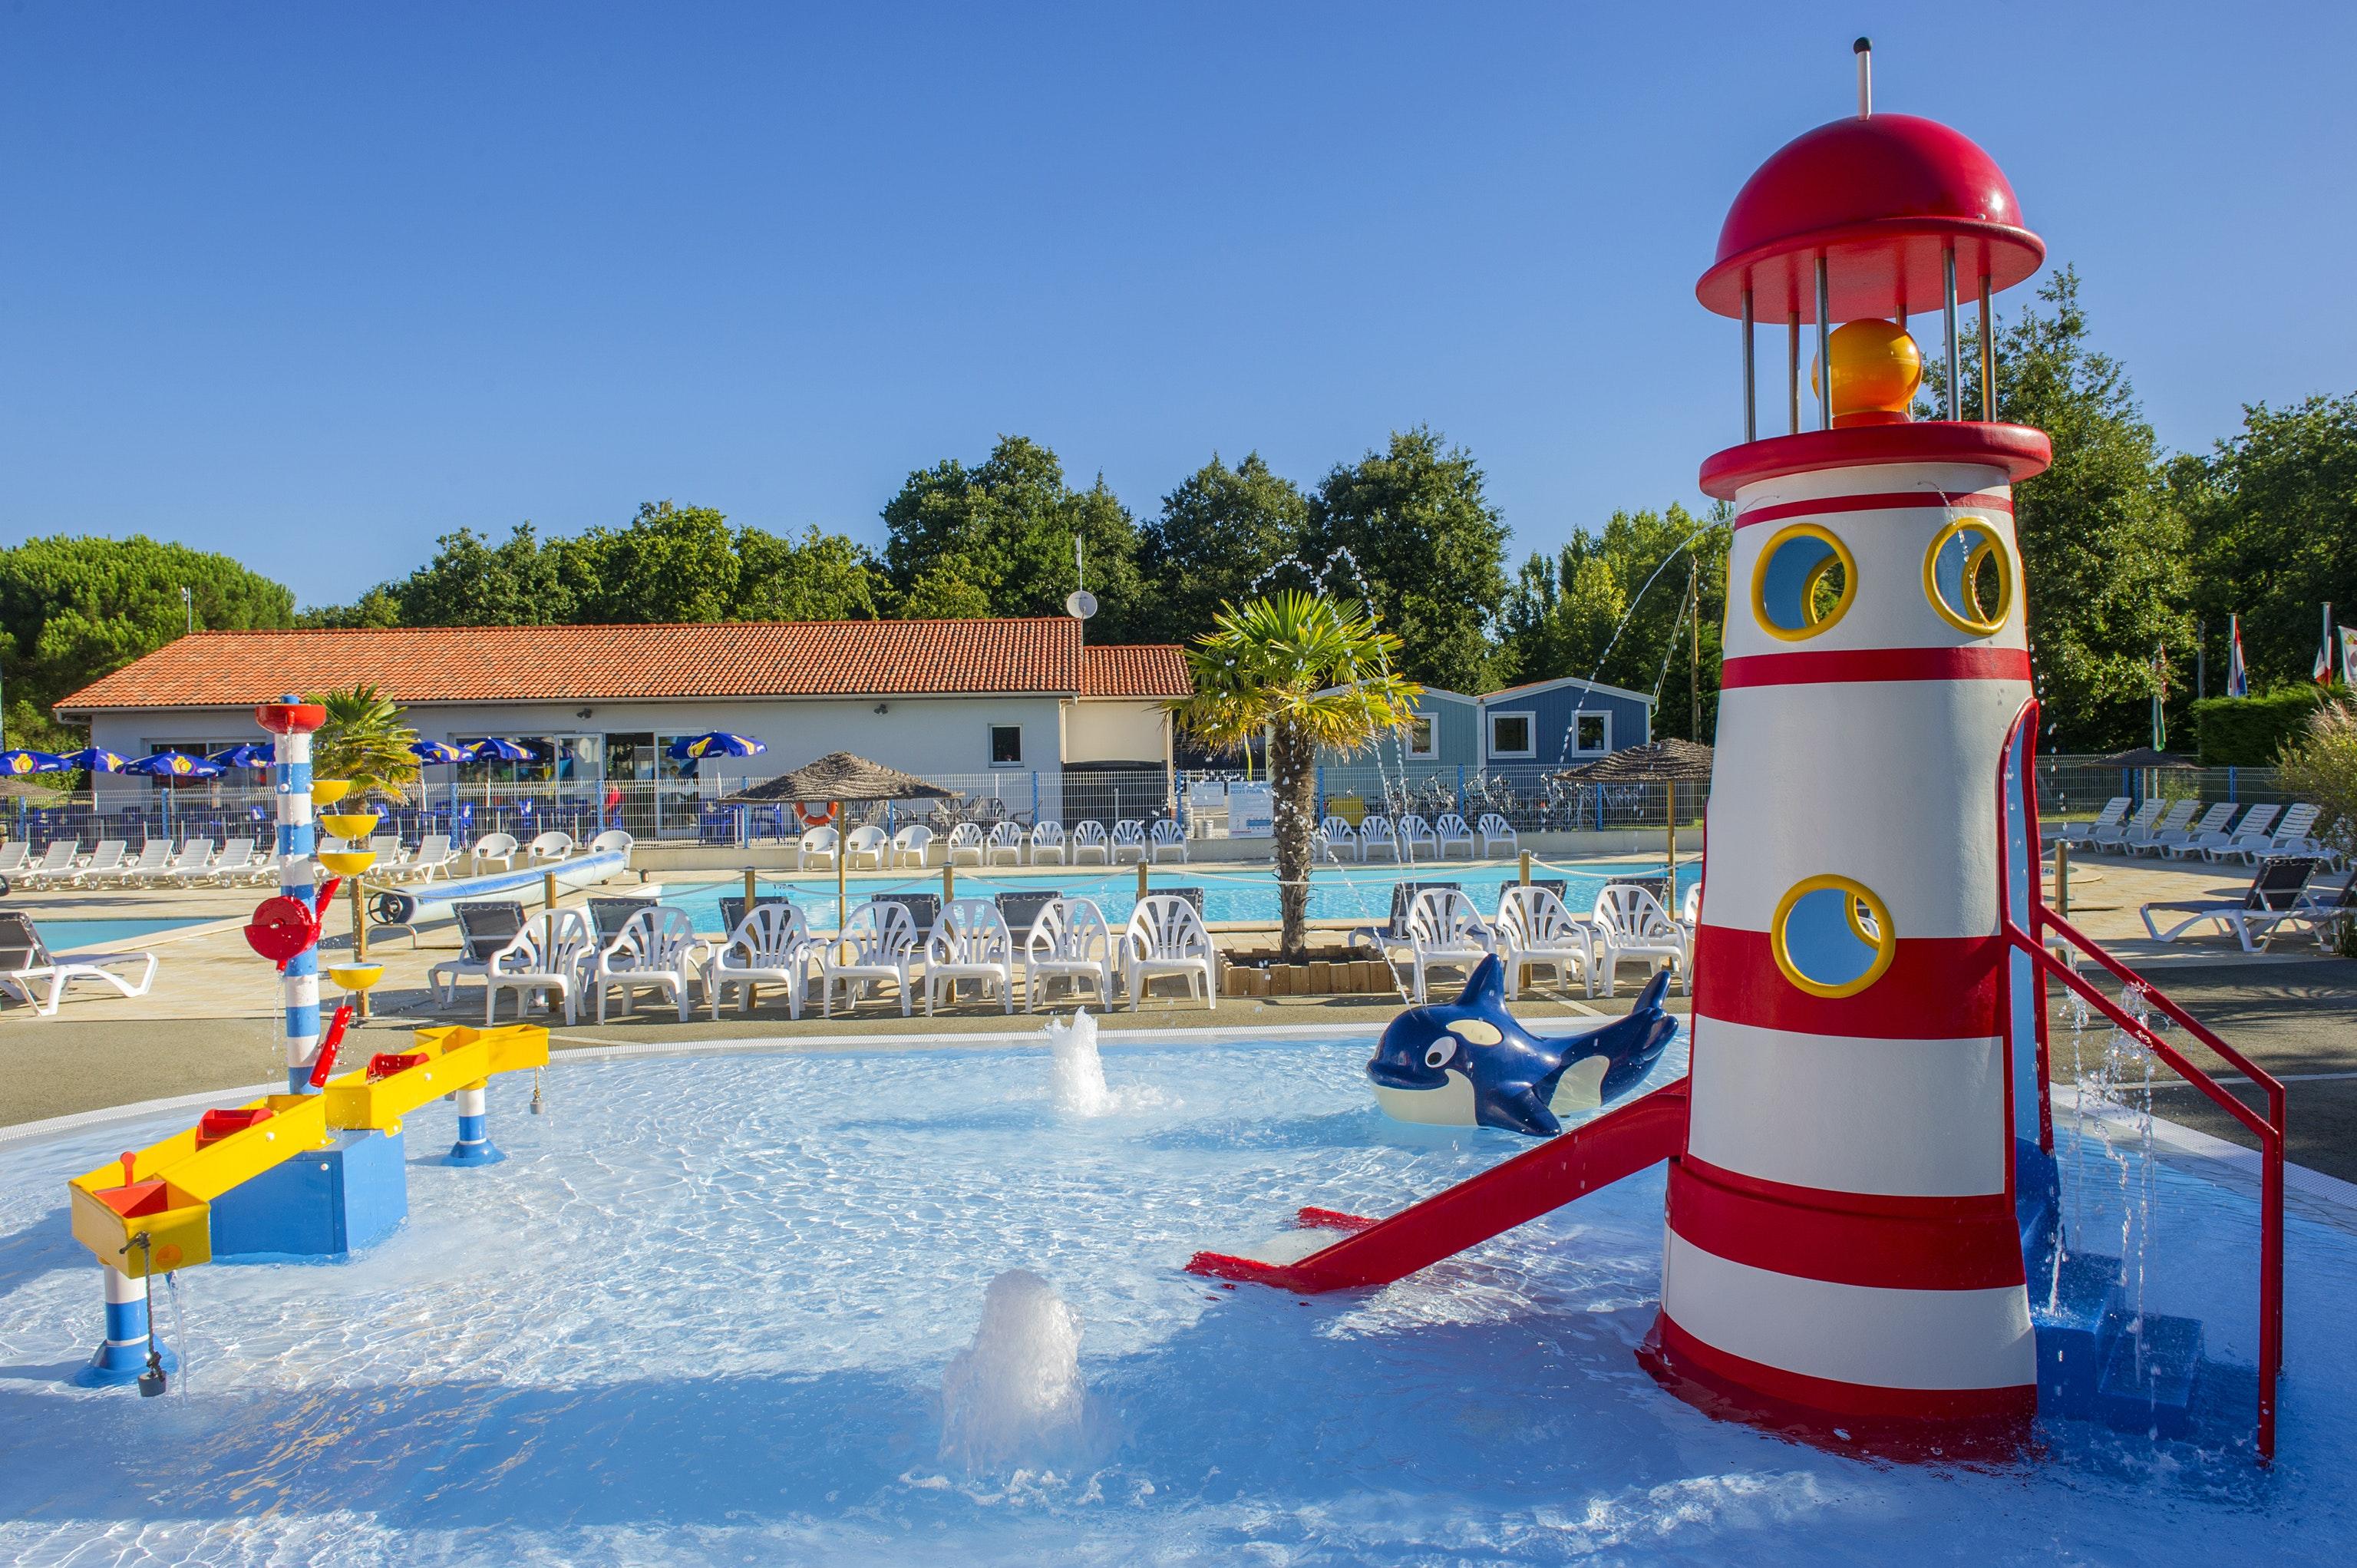 Domaine d Oleron zwembad met kinderspeelplek